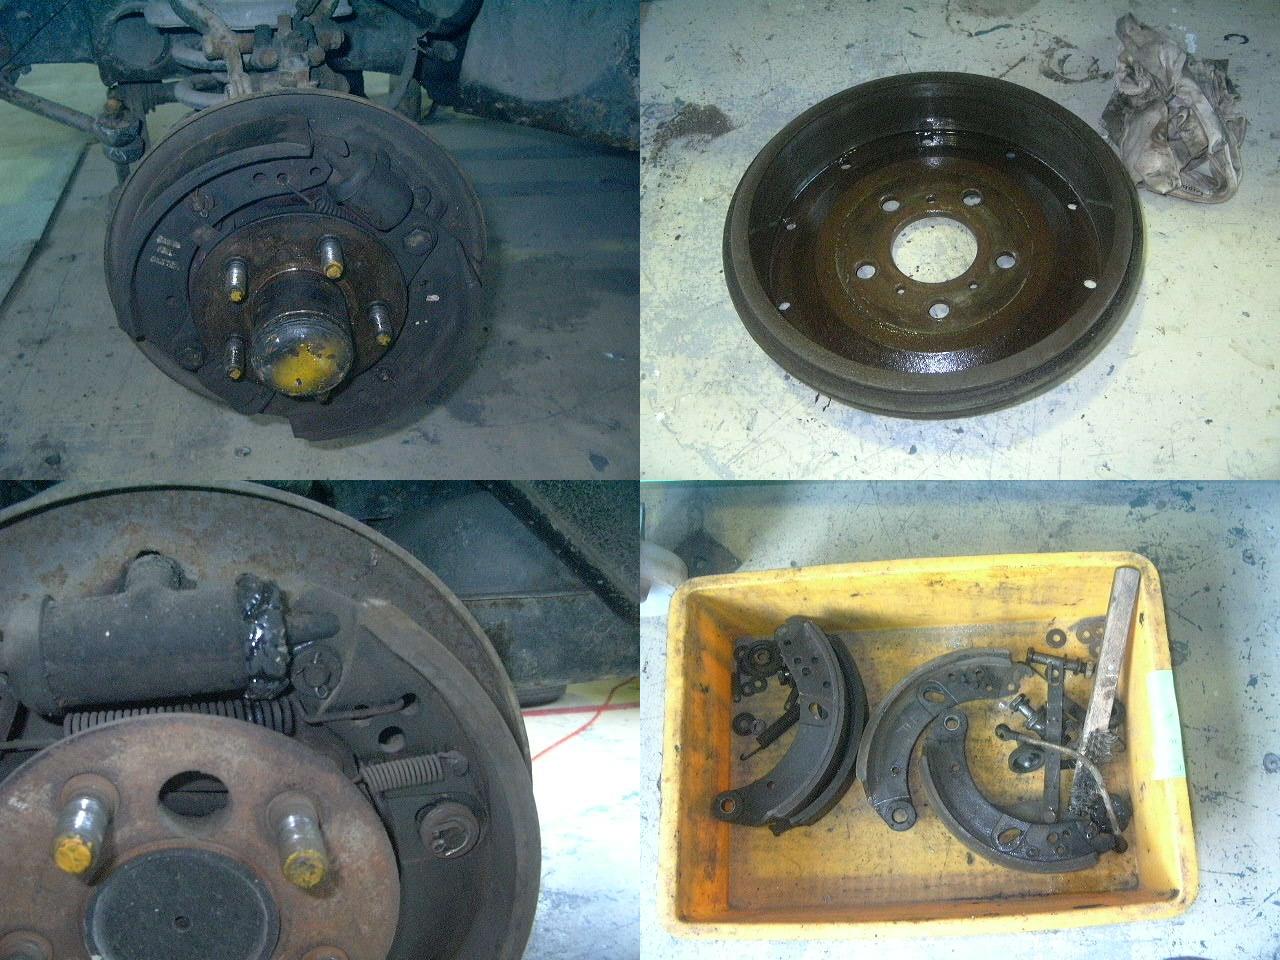 http://nakanemotors.com/blog/restore/MB220/P1060553-tile.jpg